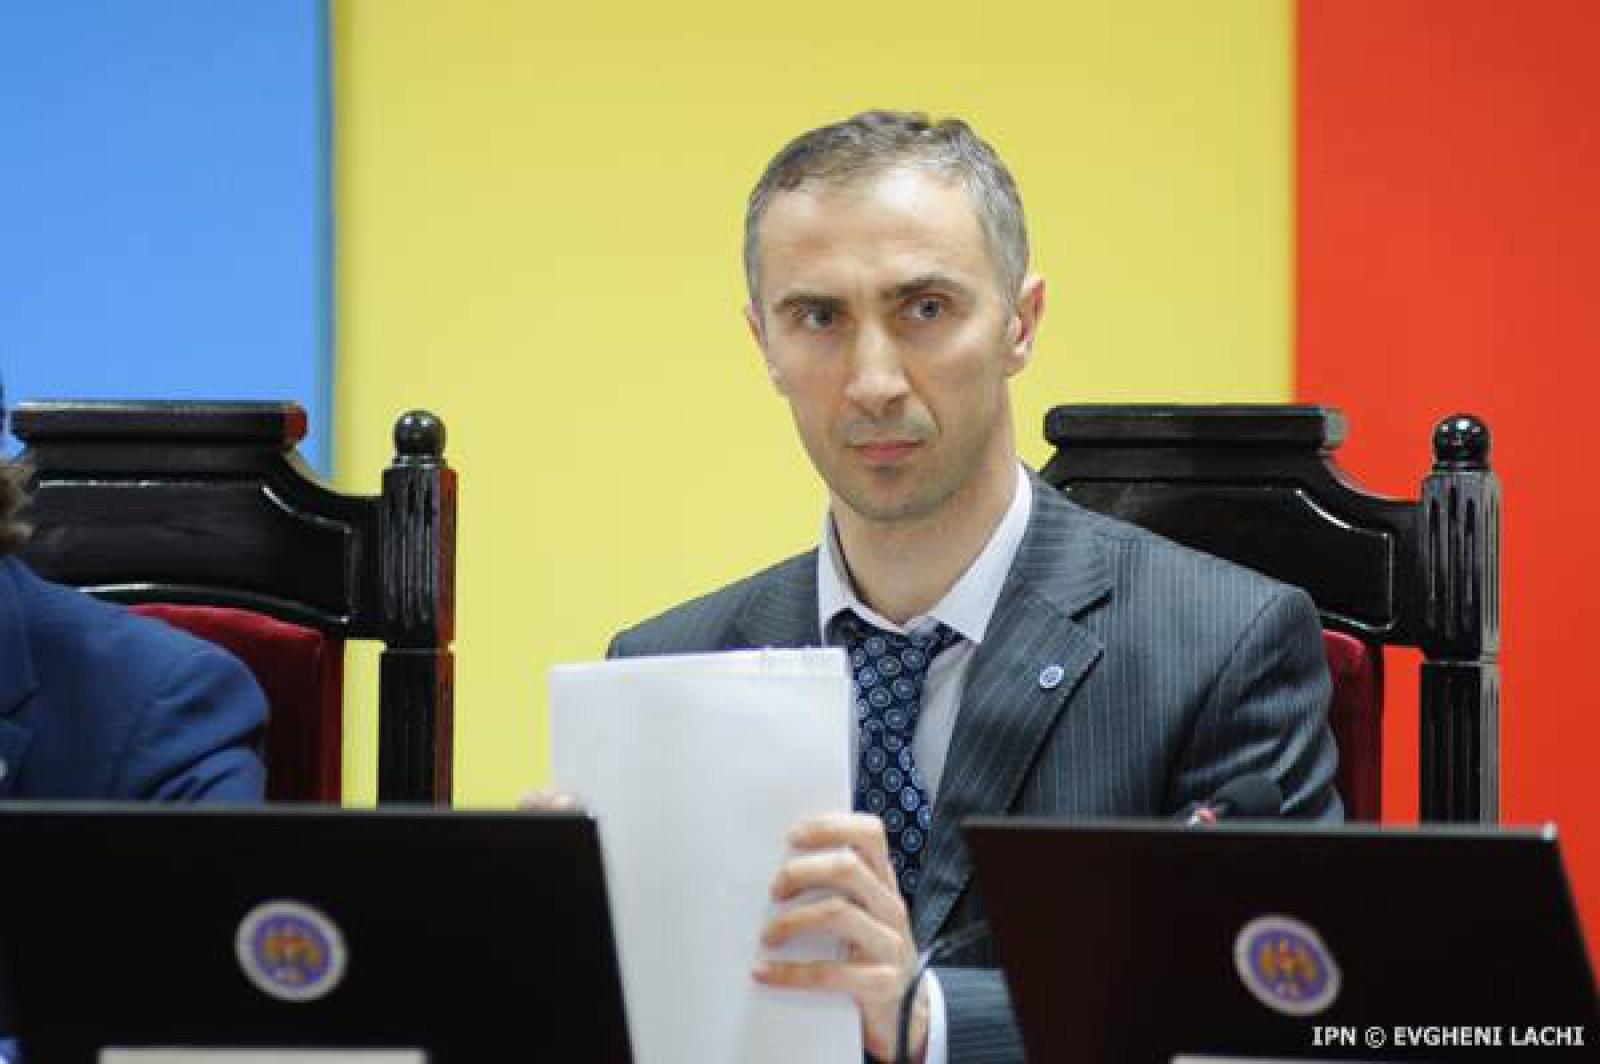 "Membru CEC, despre respingerea ""inițiativei buclucașe"